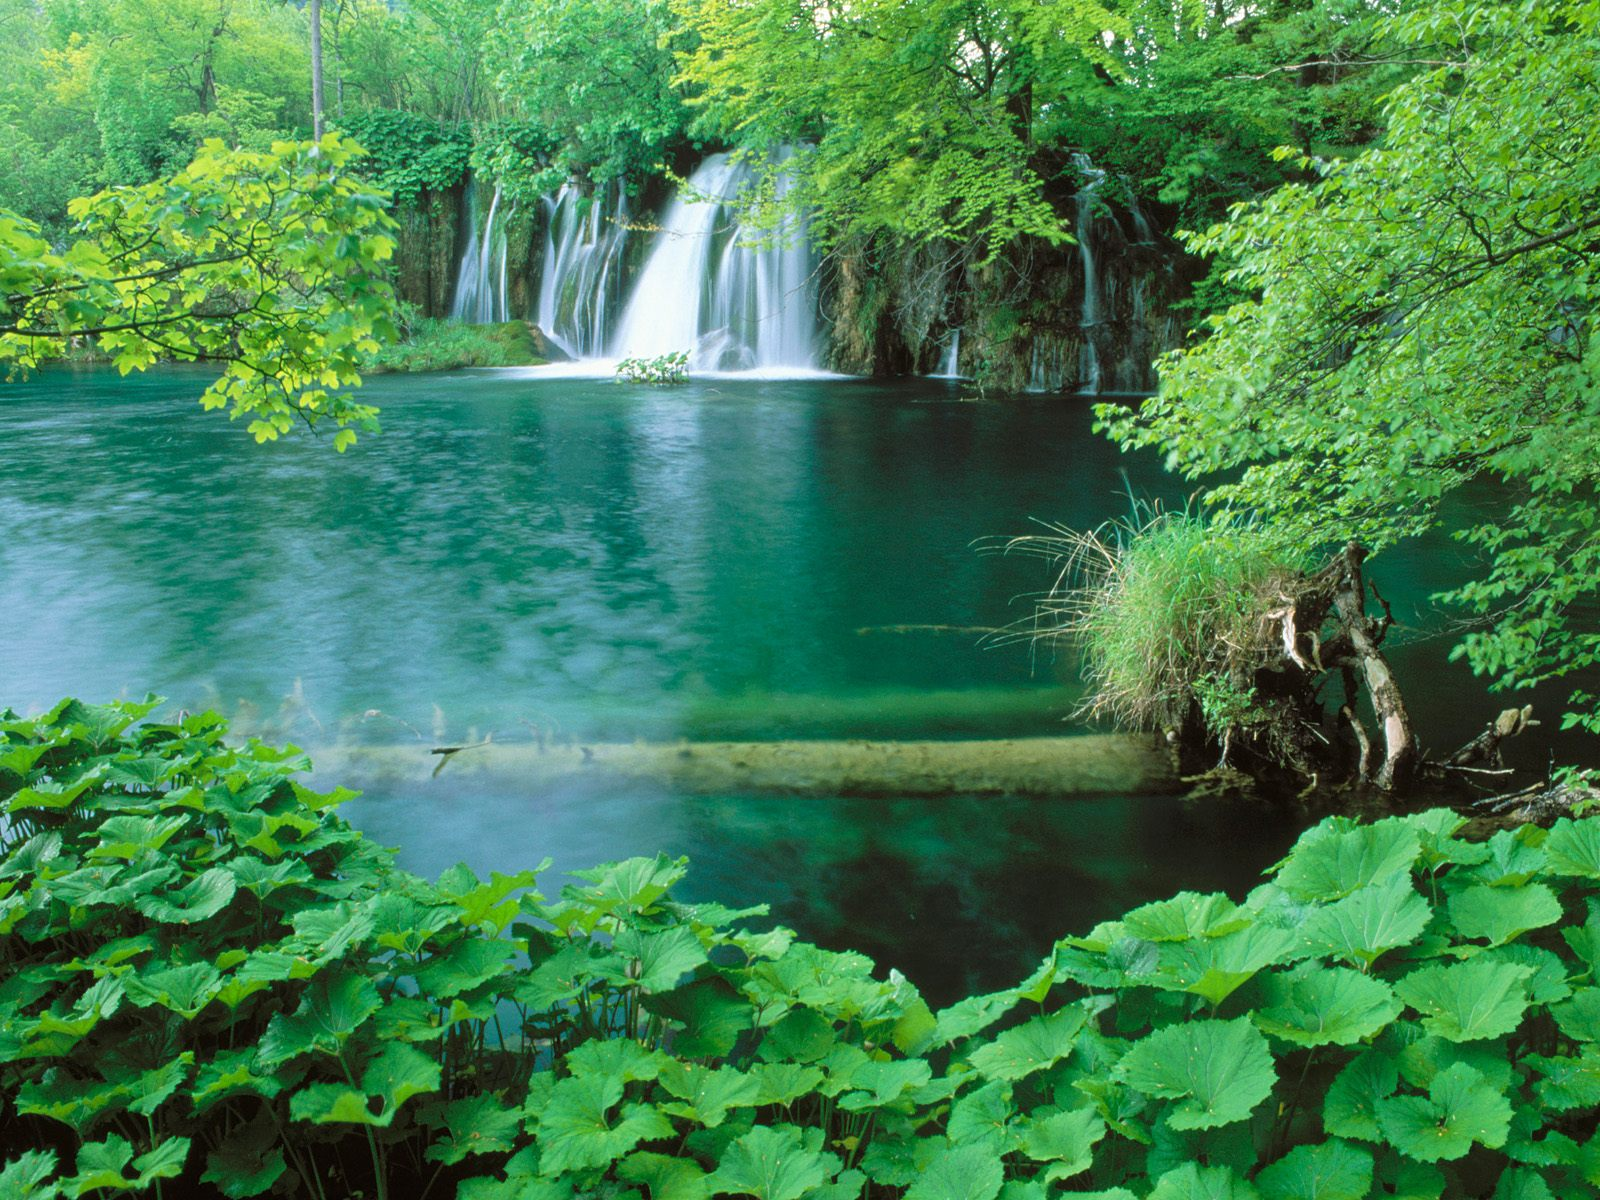 والپیر دریاچه و جنگل و آبشار